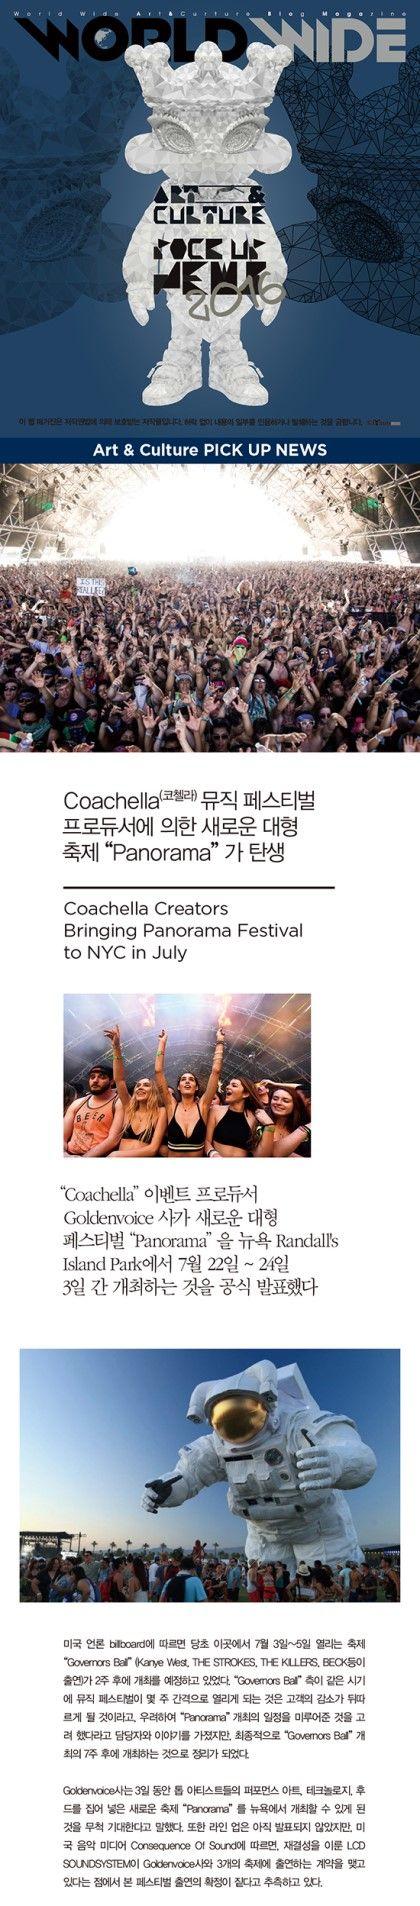 "Blog Magazine ● WORLD WIDE: Art & Culture PICK UP NEWS∥Coachella(코첼라)뮤직 페스티벌 프로듀서에 의한 새로운 대형 축제 ""Panorama""가 탄생 : 네이버 블로그"